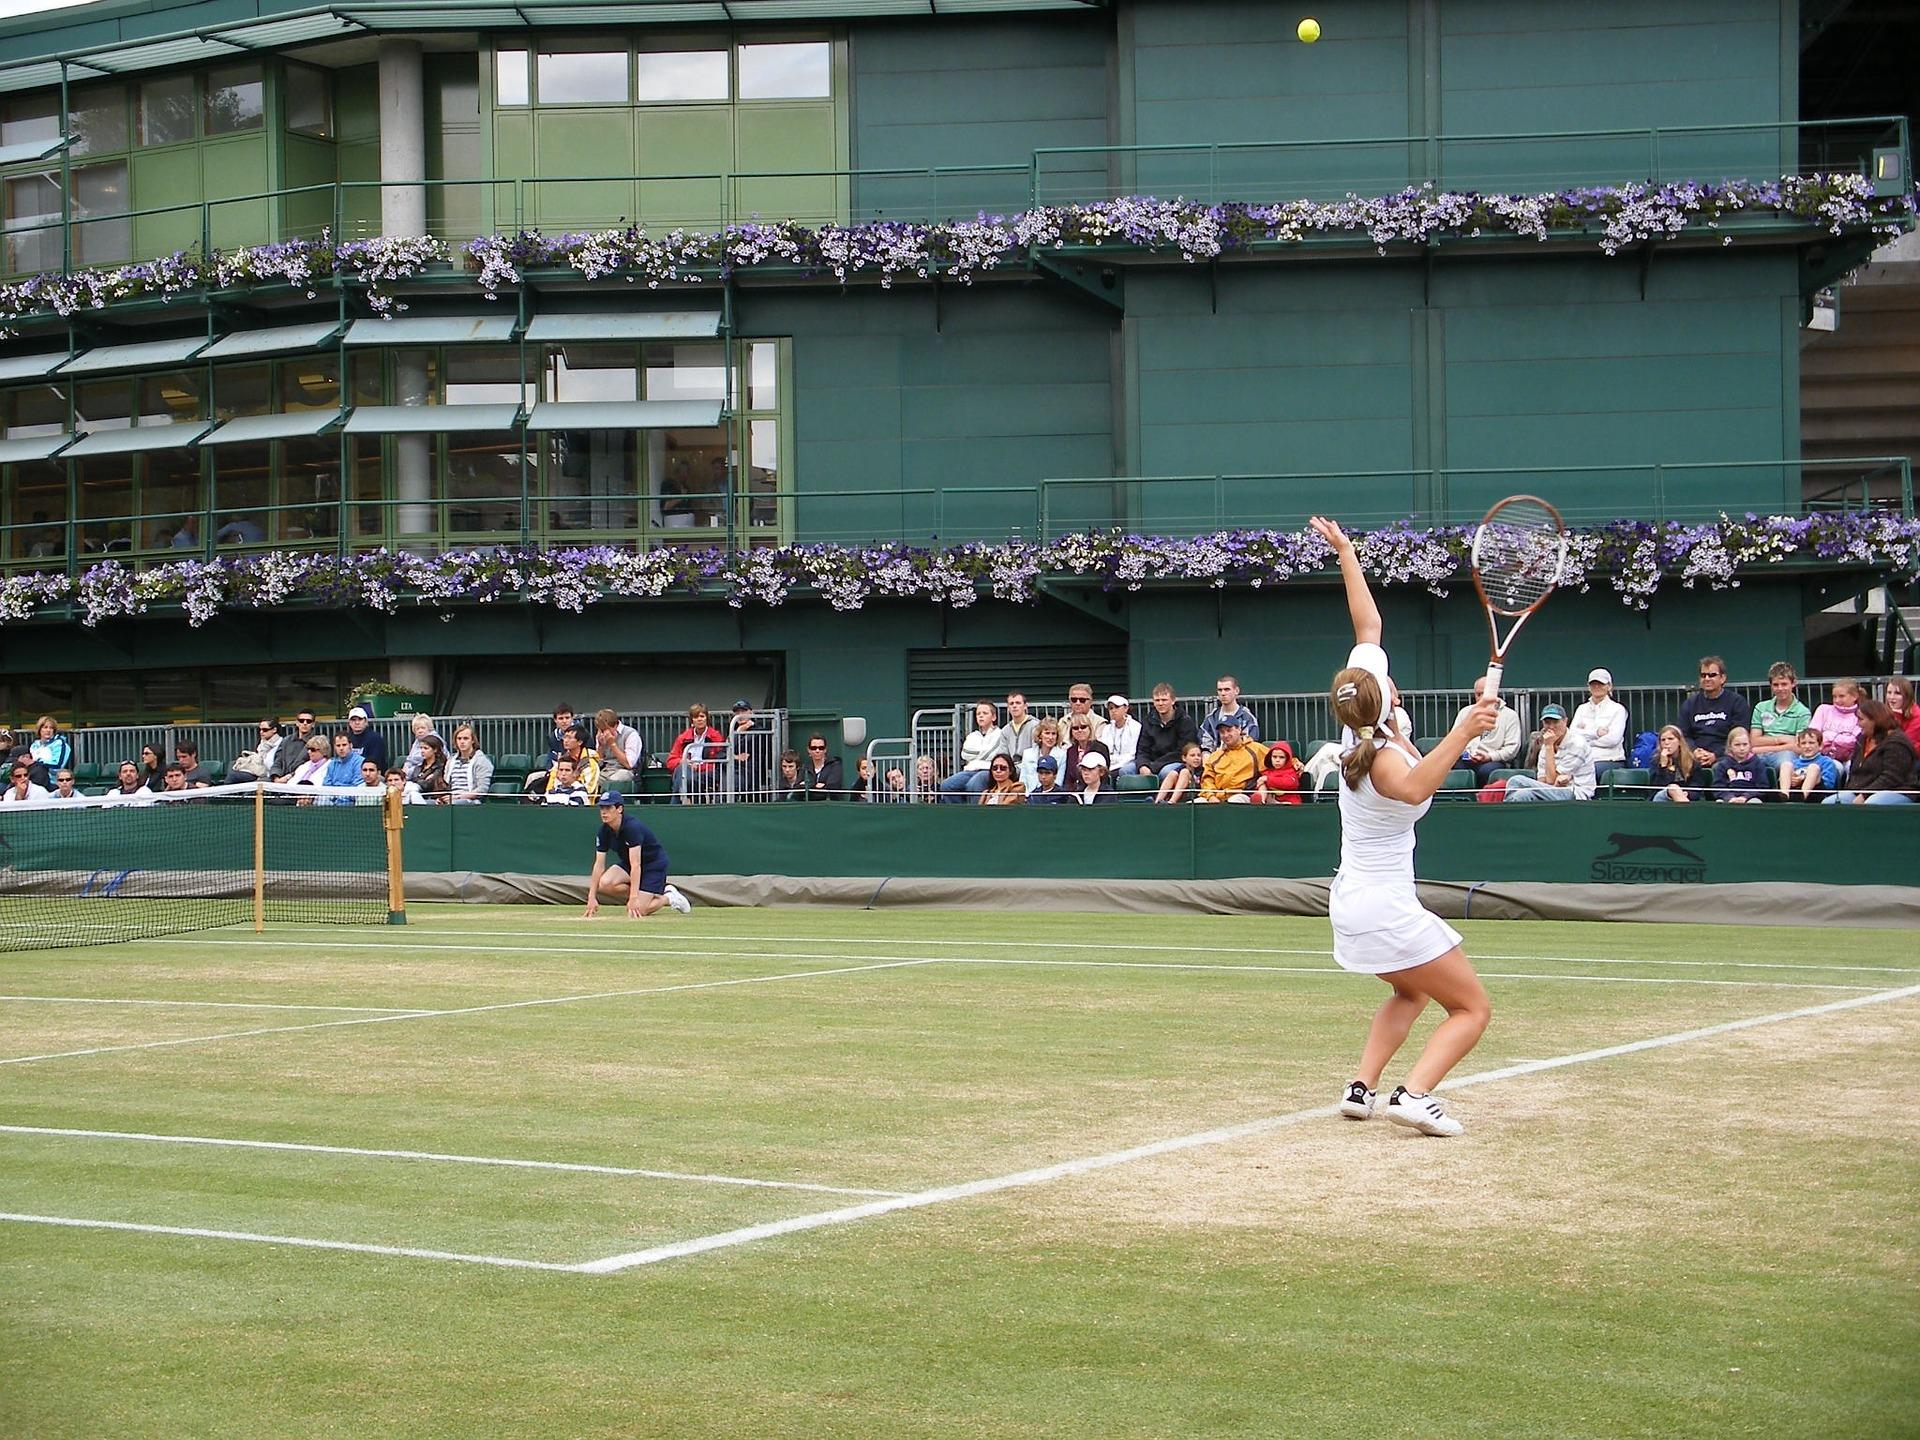 Le Wimbledon